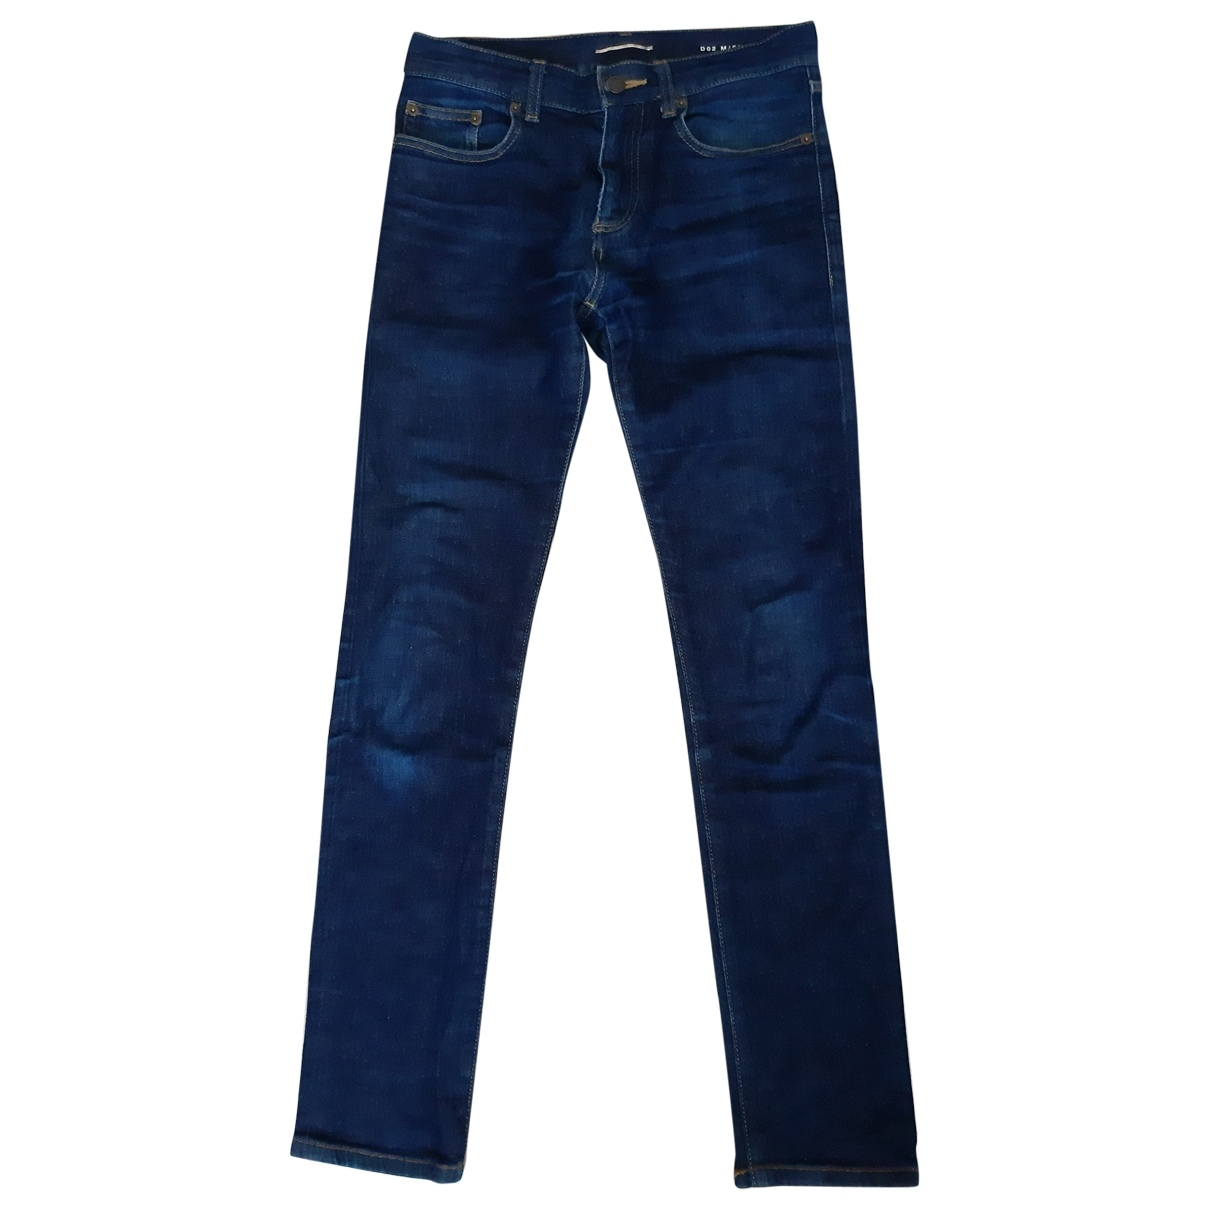 Saint Laurent \N Navy Cotton - elasthane Jeans for Men 38 FR